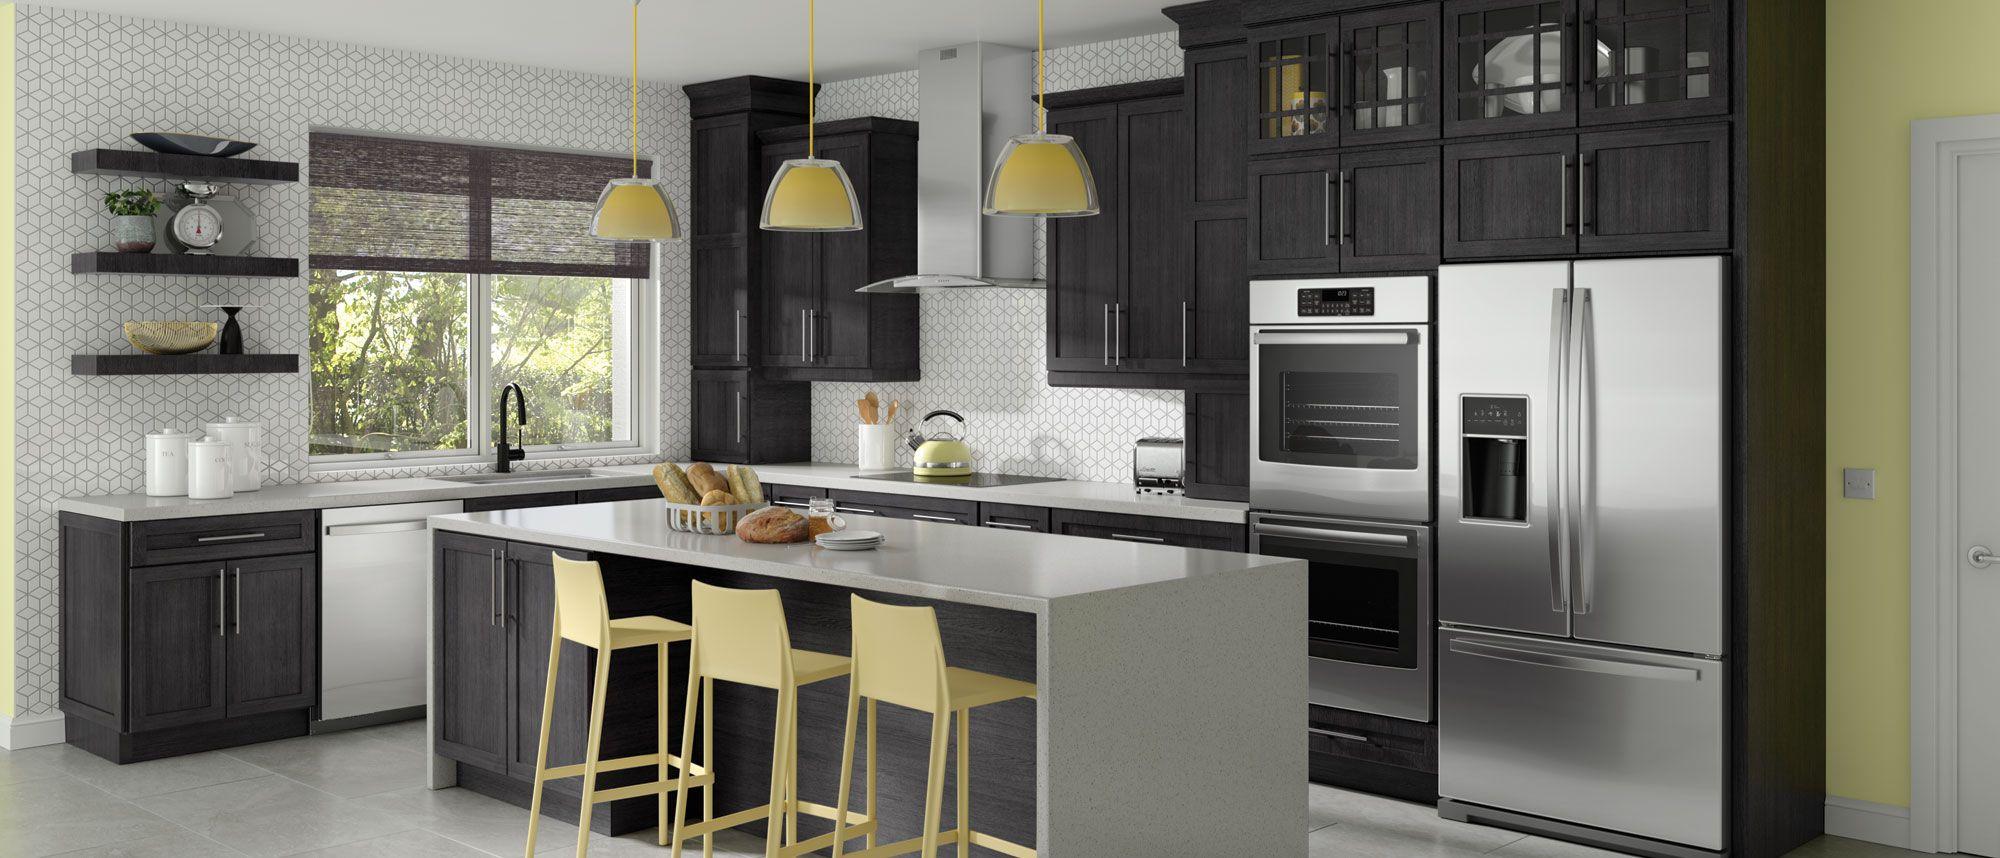 Builders choice new kitchen loft spaces